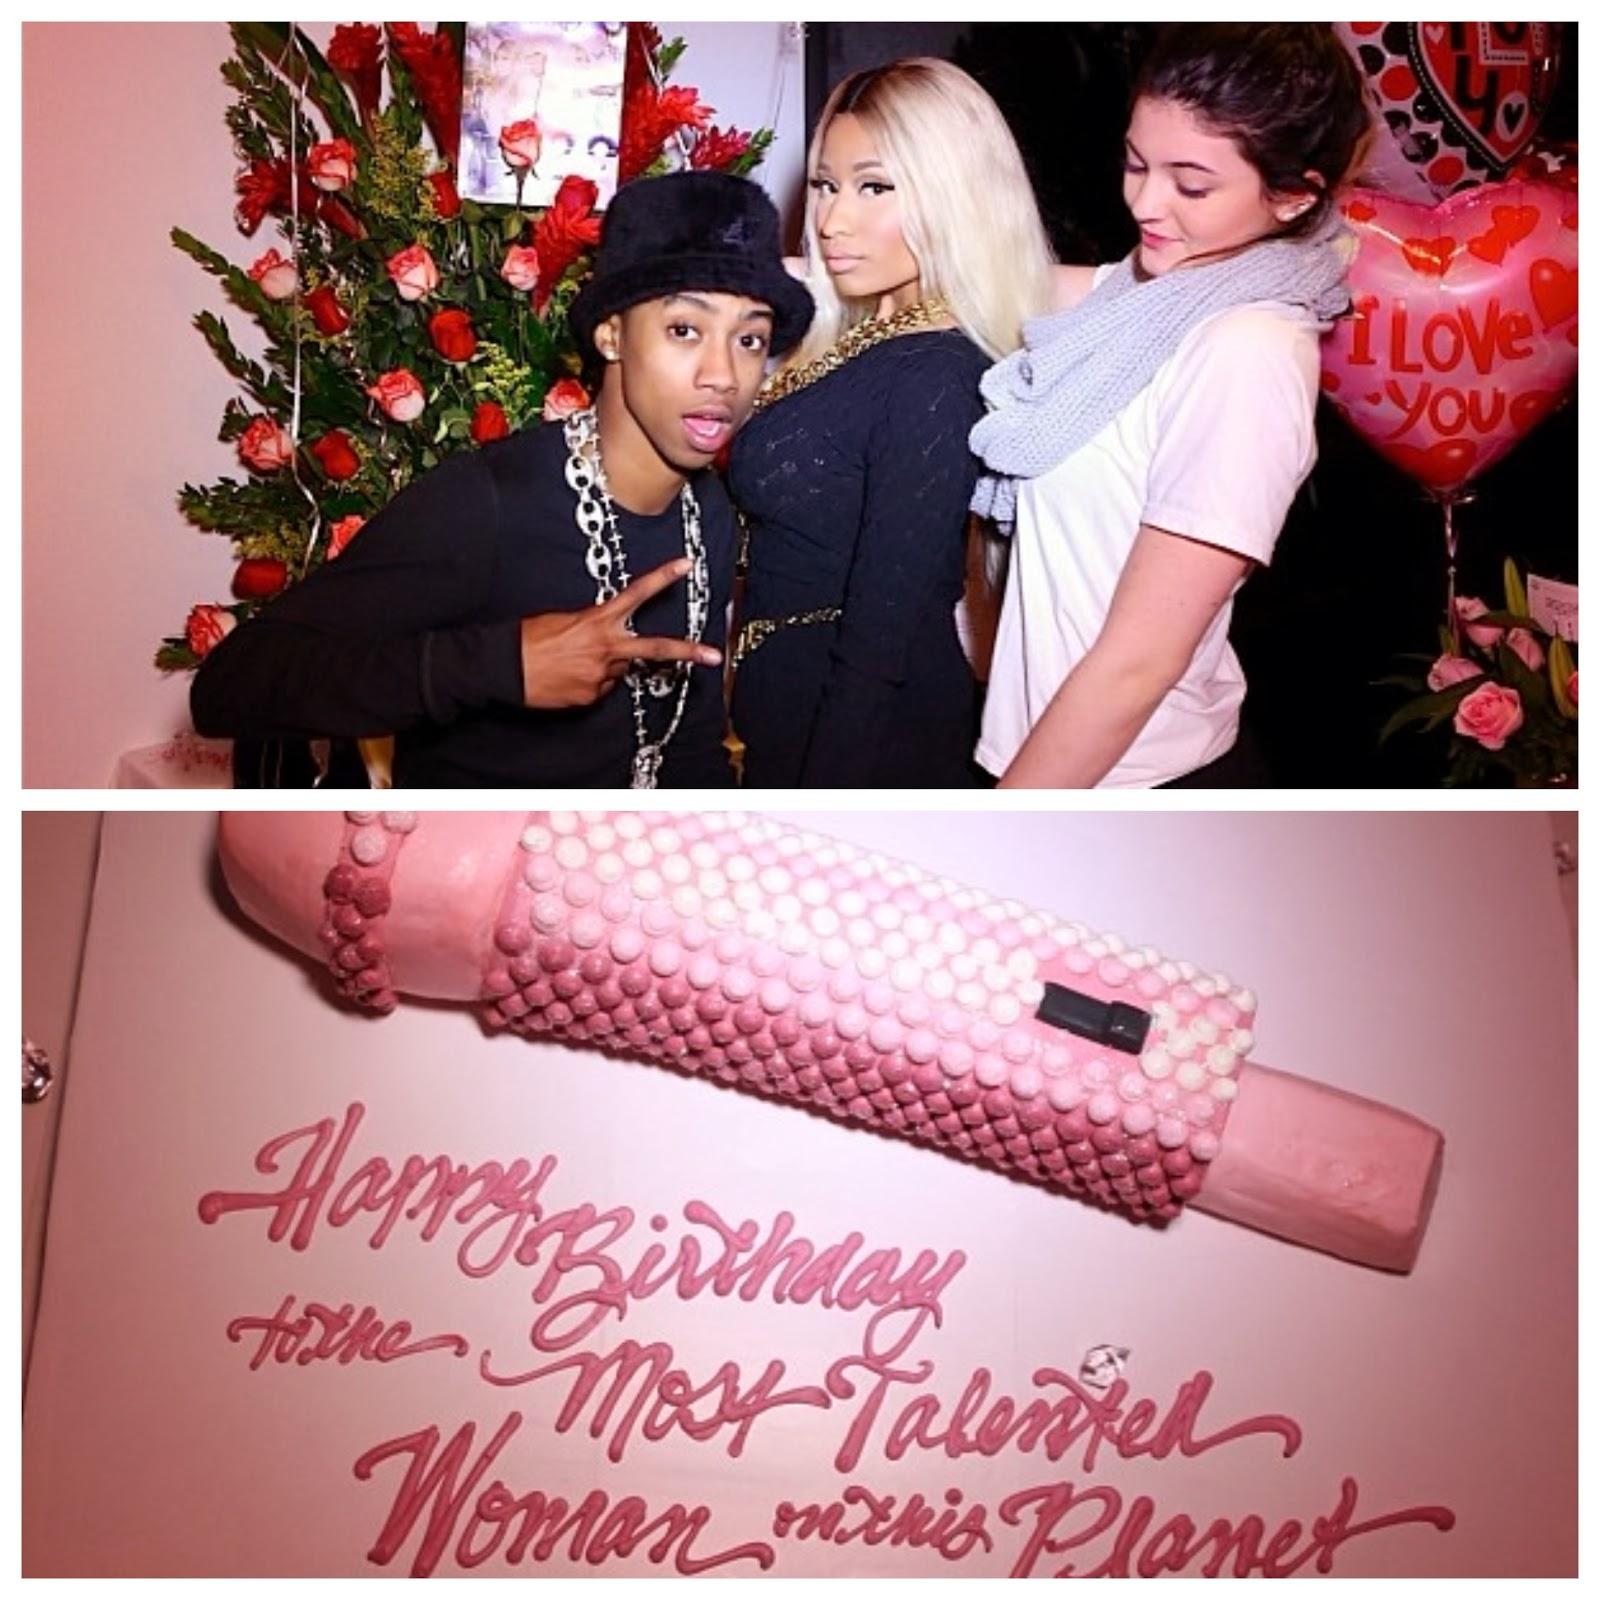 Enjoyable Nicki Minaj Celebrates 31St Birthday With Safaree Kylie Jenner Personalised Birthday Cards Paralily Jamesorg